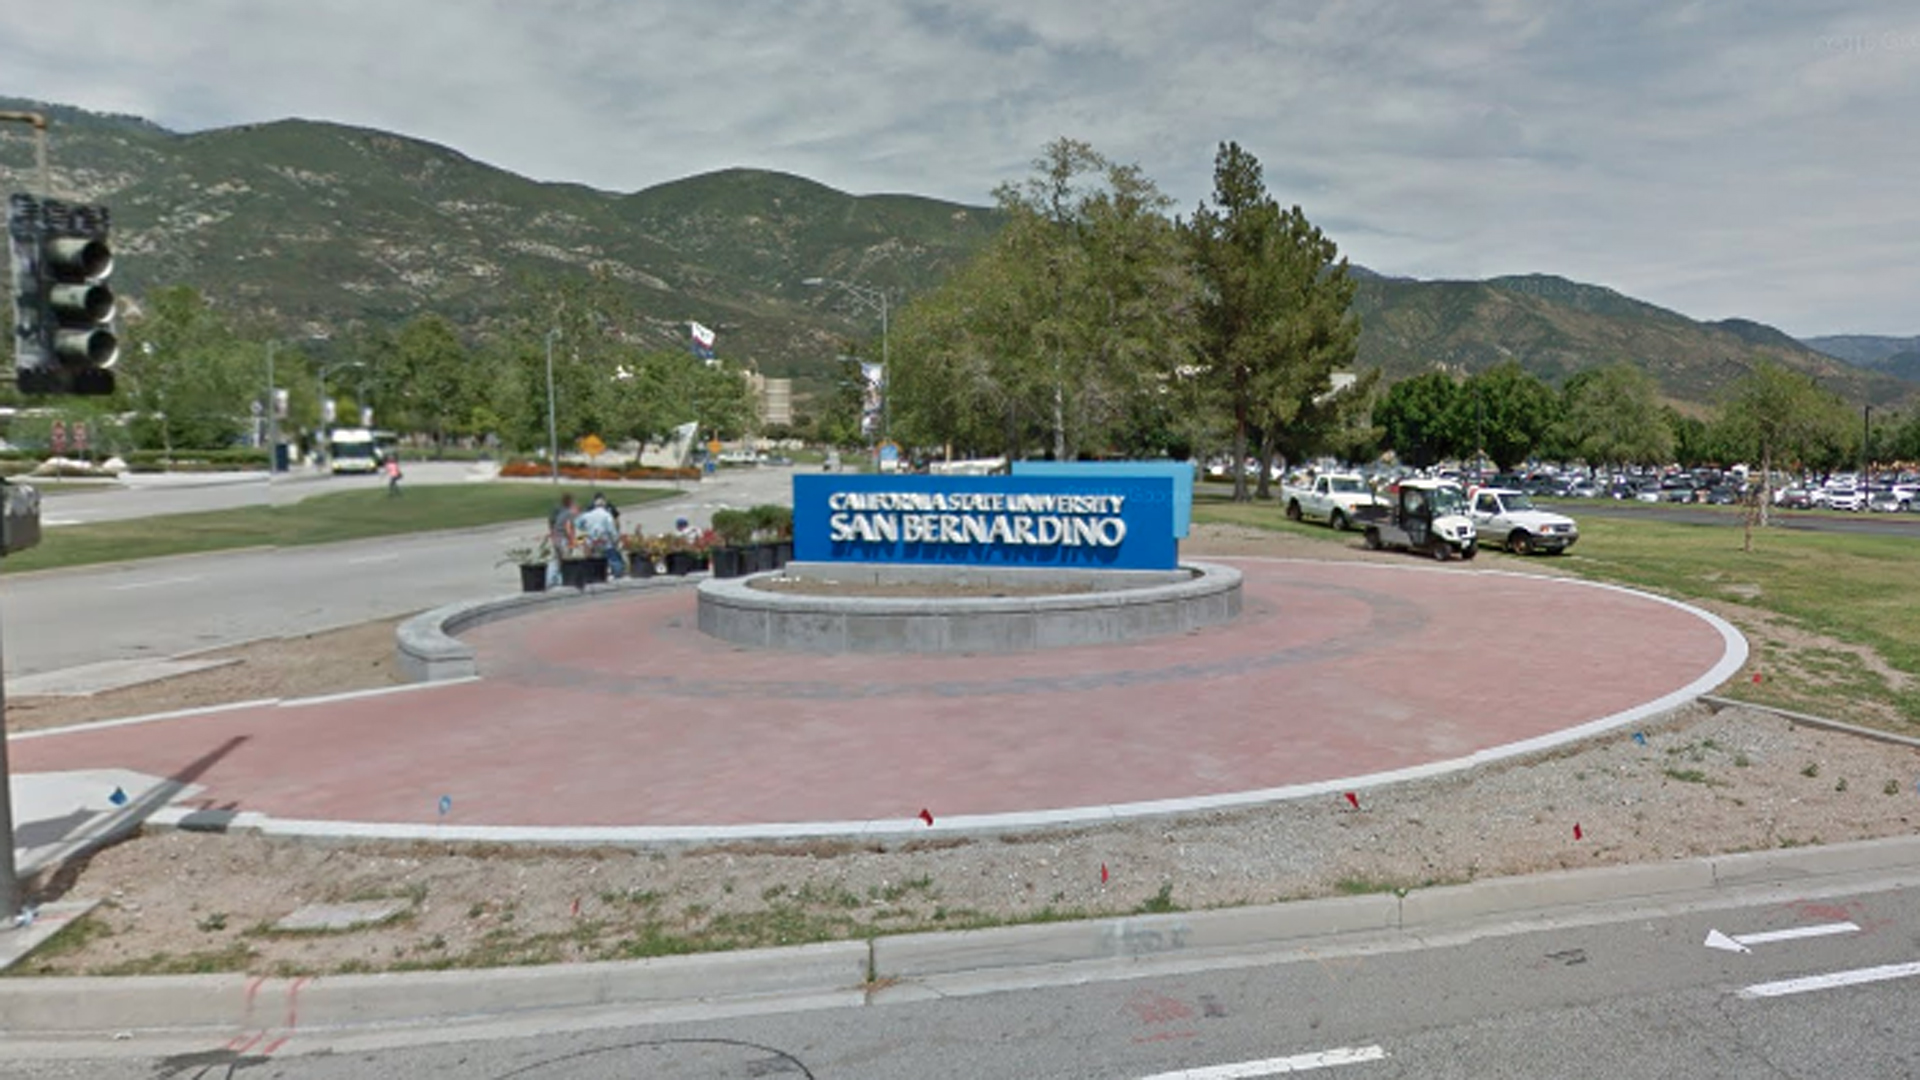 The California State University San Bernardino campus is seen in this Google Maps Street View image.